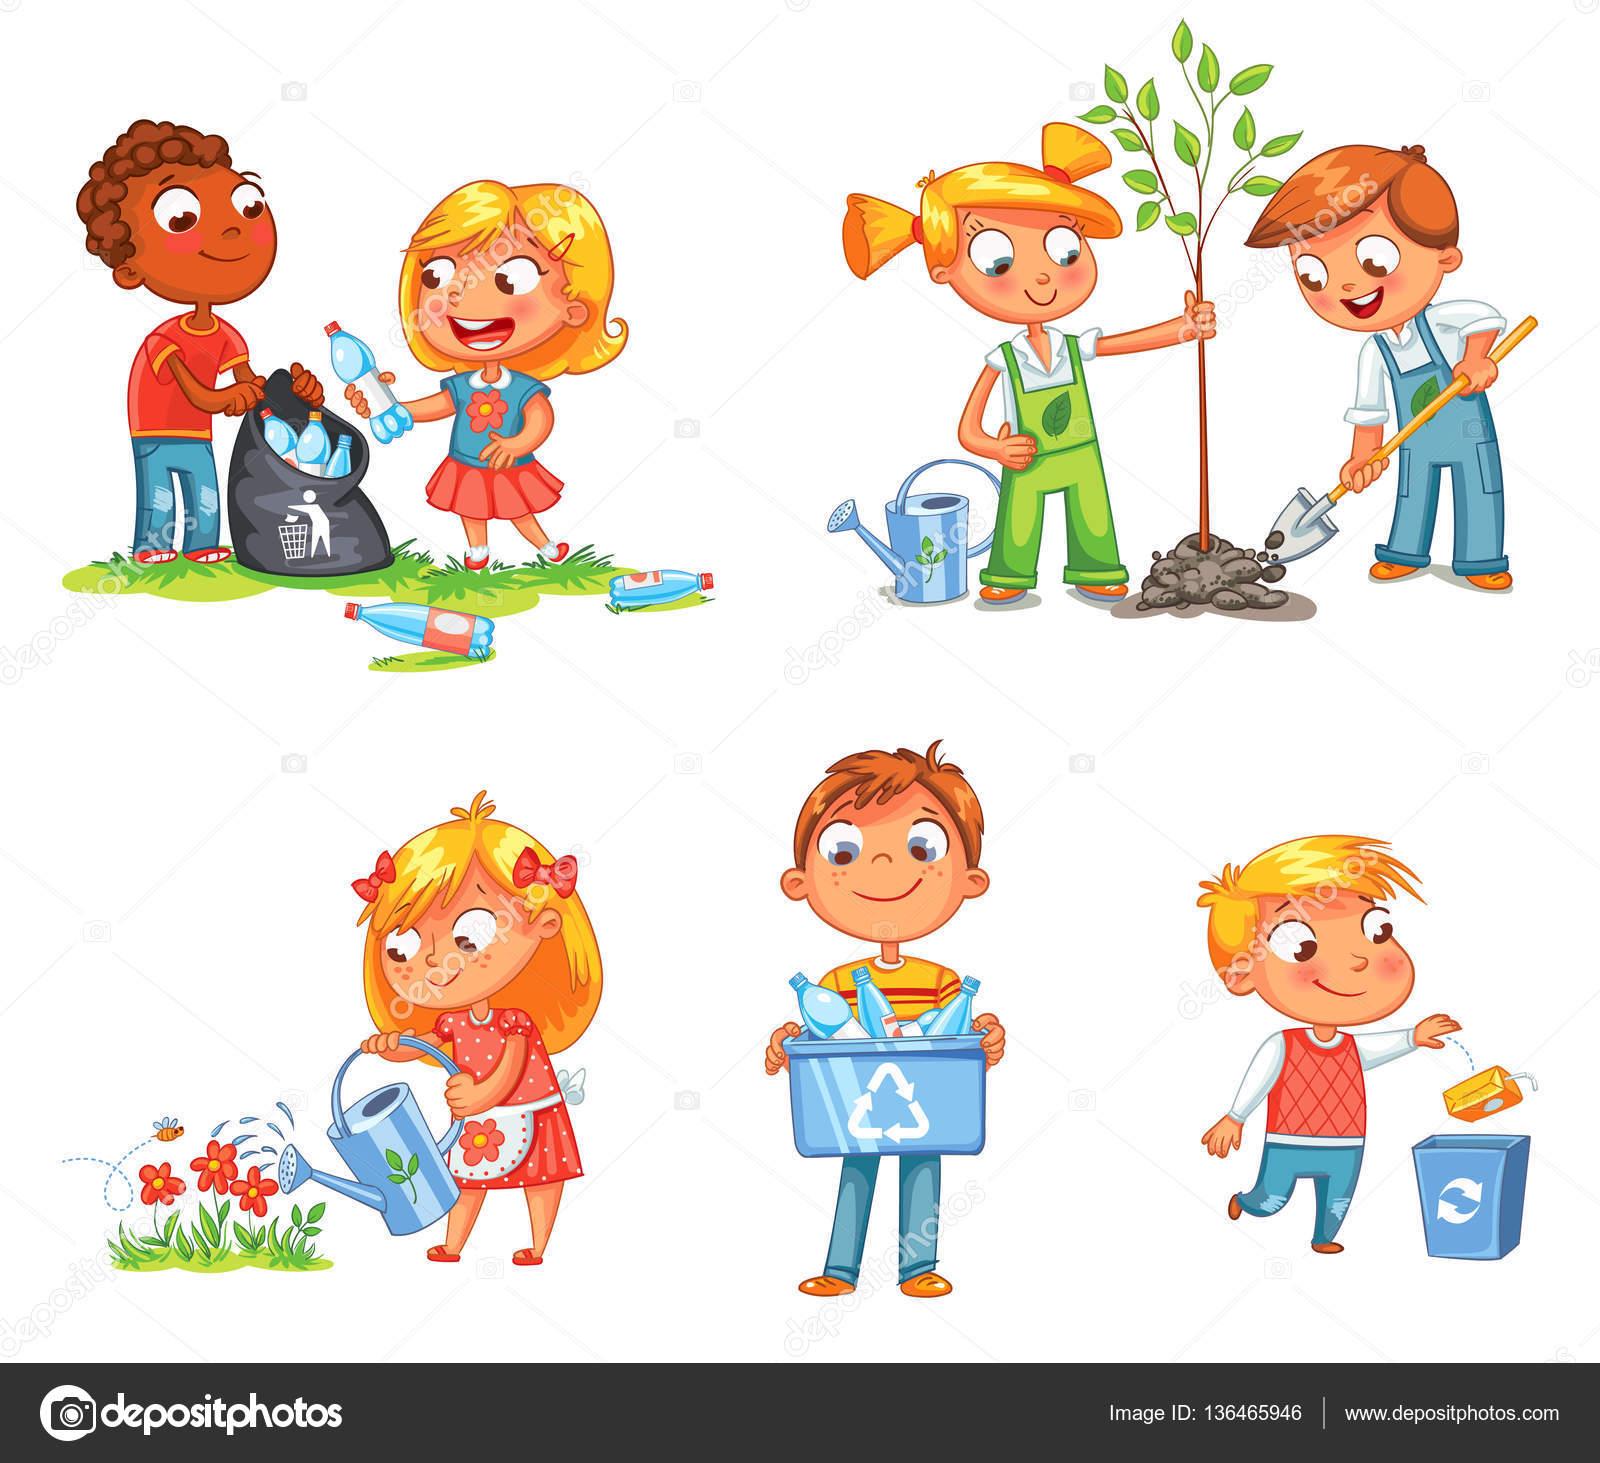 Okologische Kinder Design Lustige Comic Figur Stockvektor